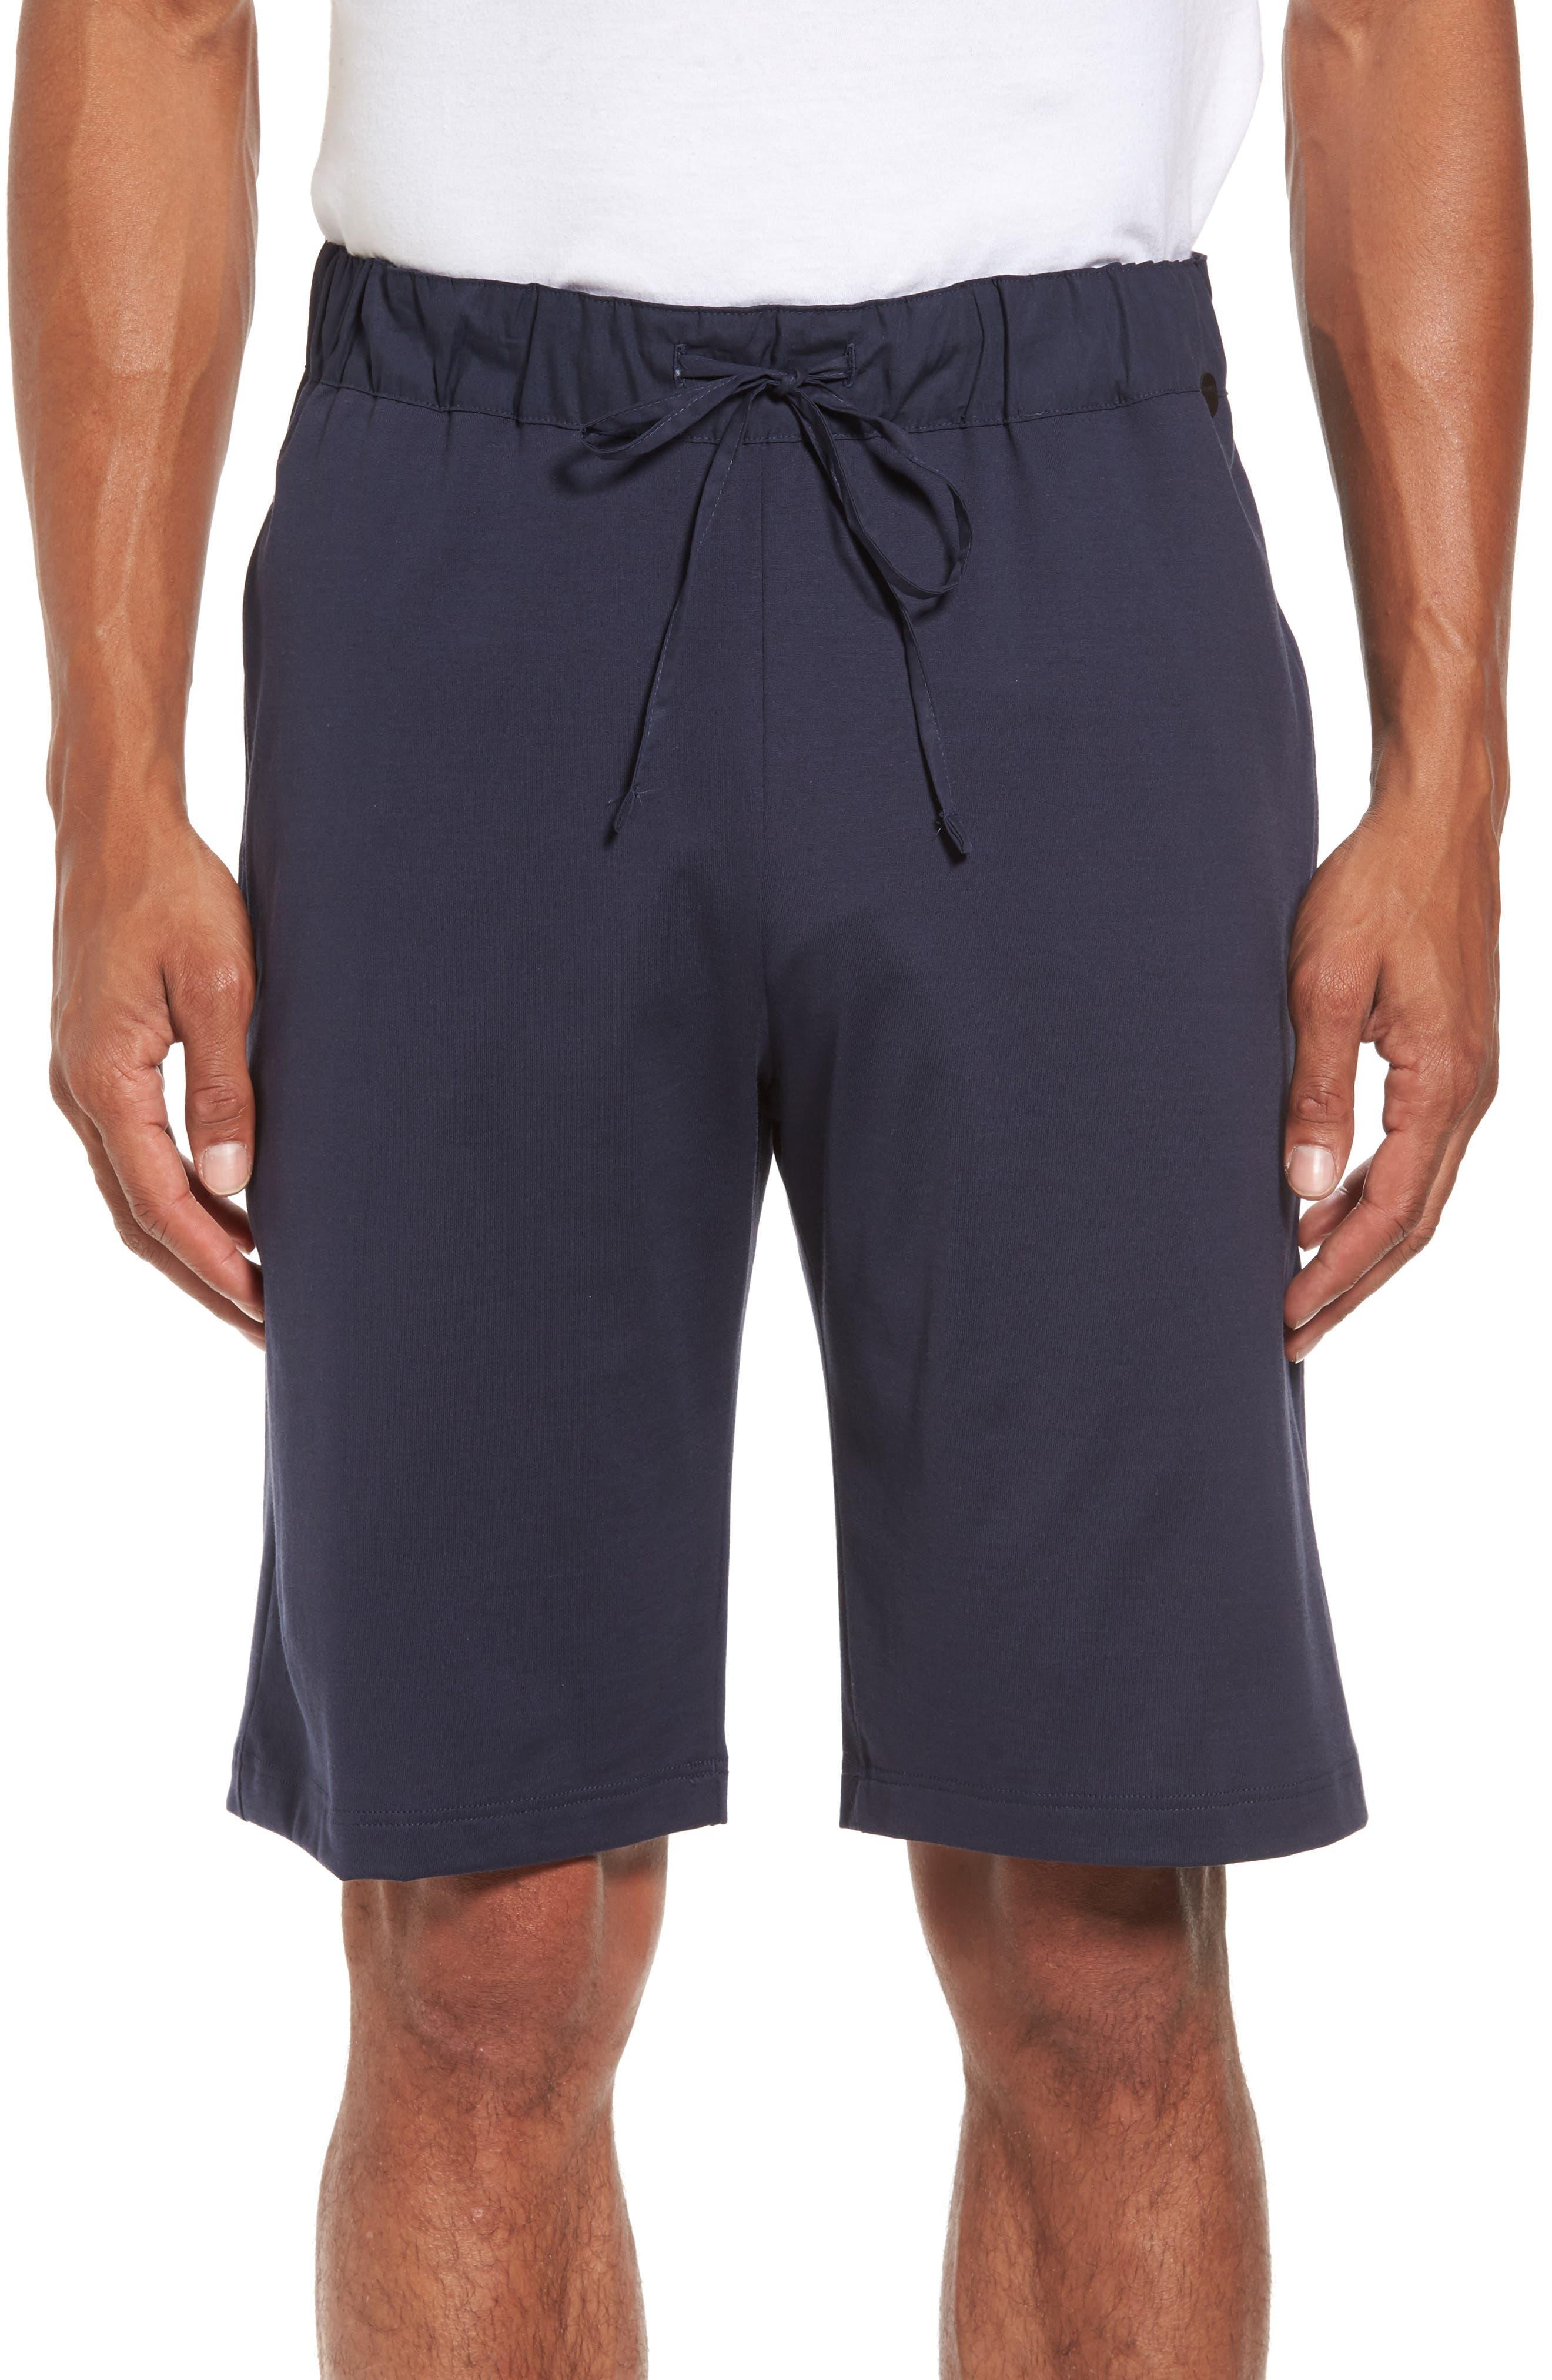 Alternate Image 1 Selected - Hanro Night & Day Knit Shorts